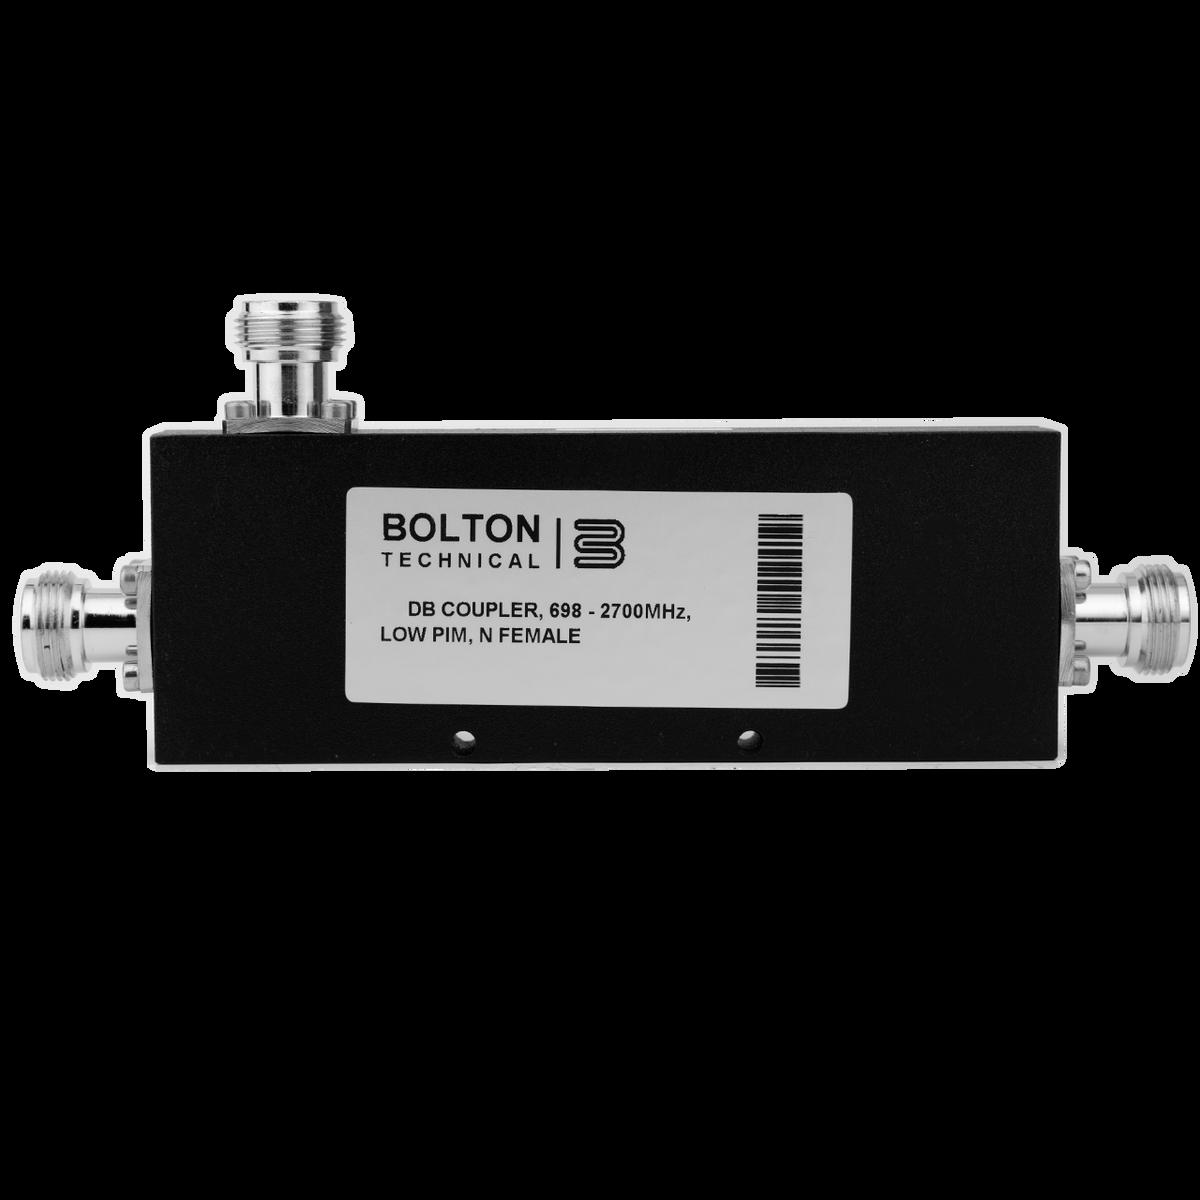 Bolton Technical 6 dB Coupler, 698-2700 MHz, Low-PIM, N-Female